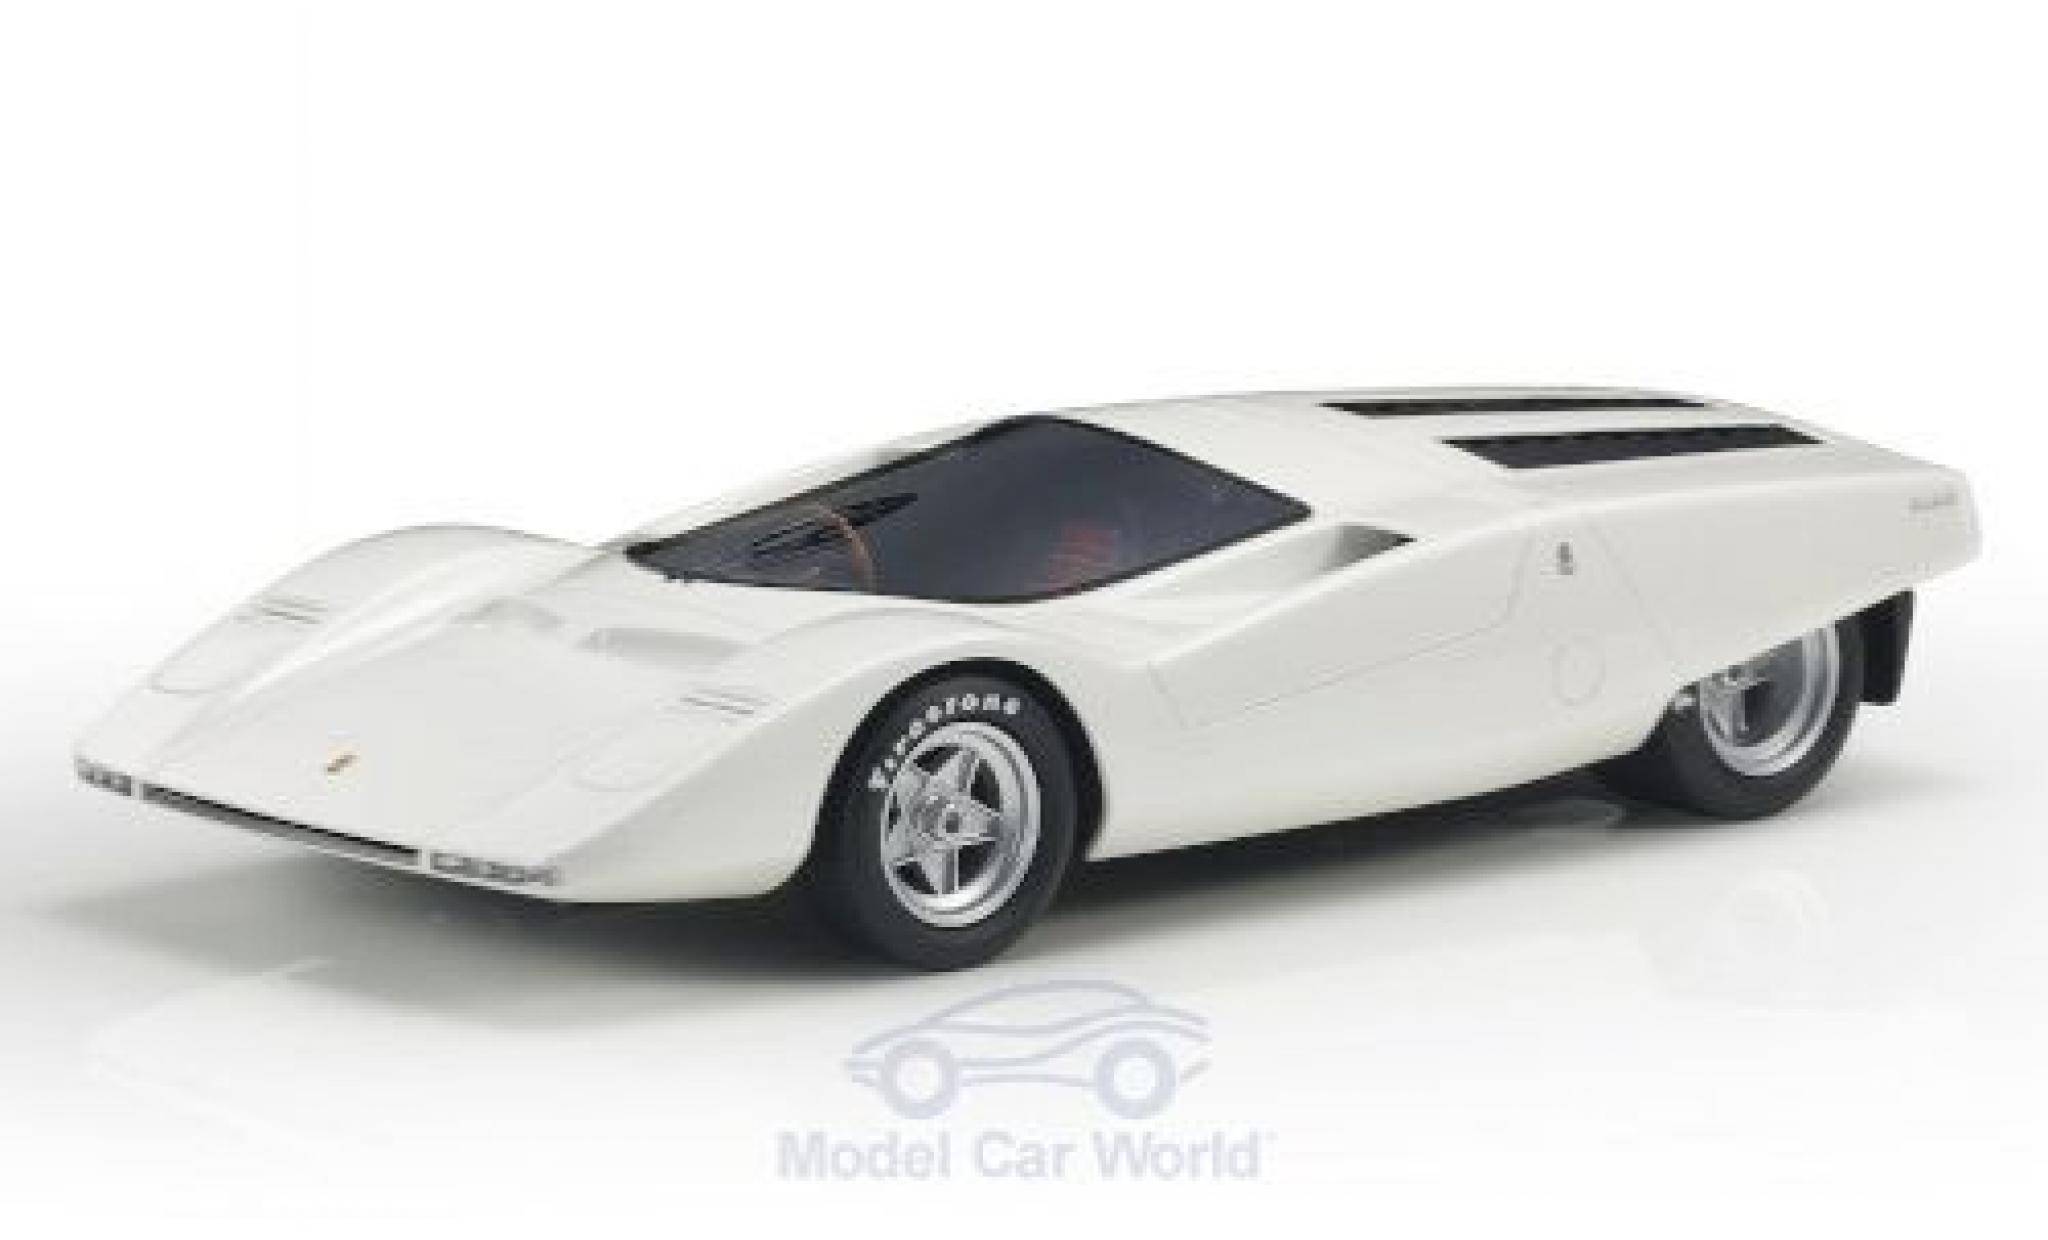 Ferrari 512 1/18 Topmarques Collectibles S Berlinetta Concept métallisé blanche RHD 1969